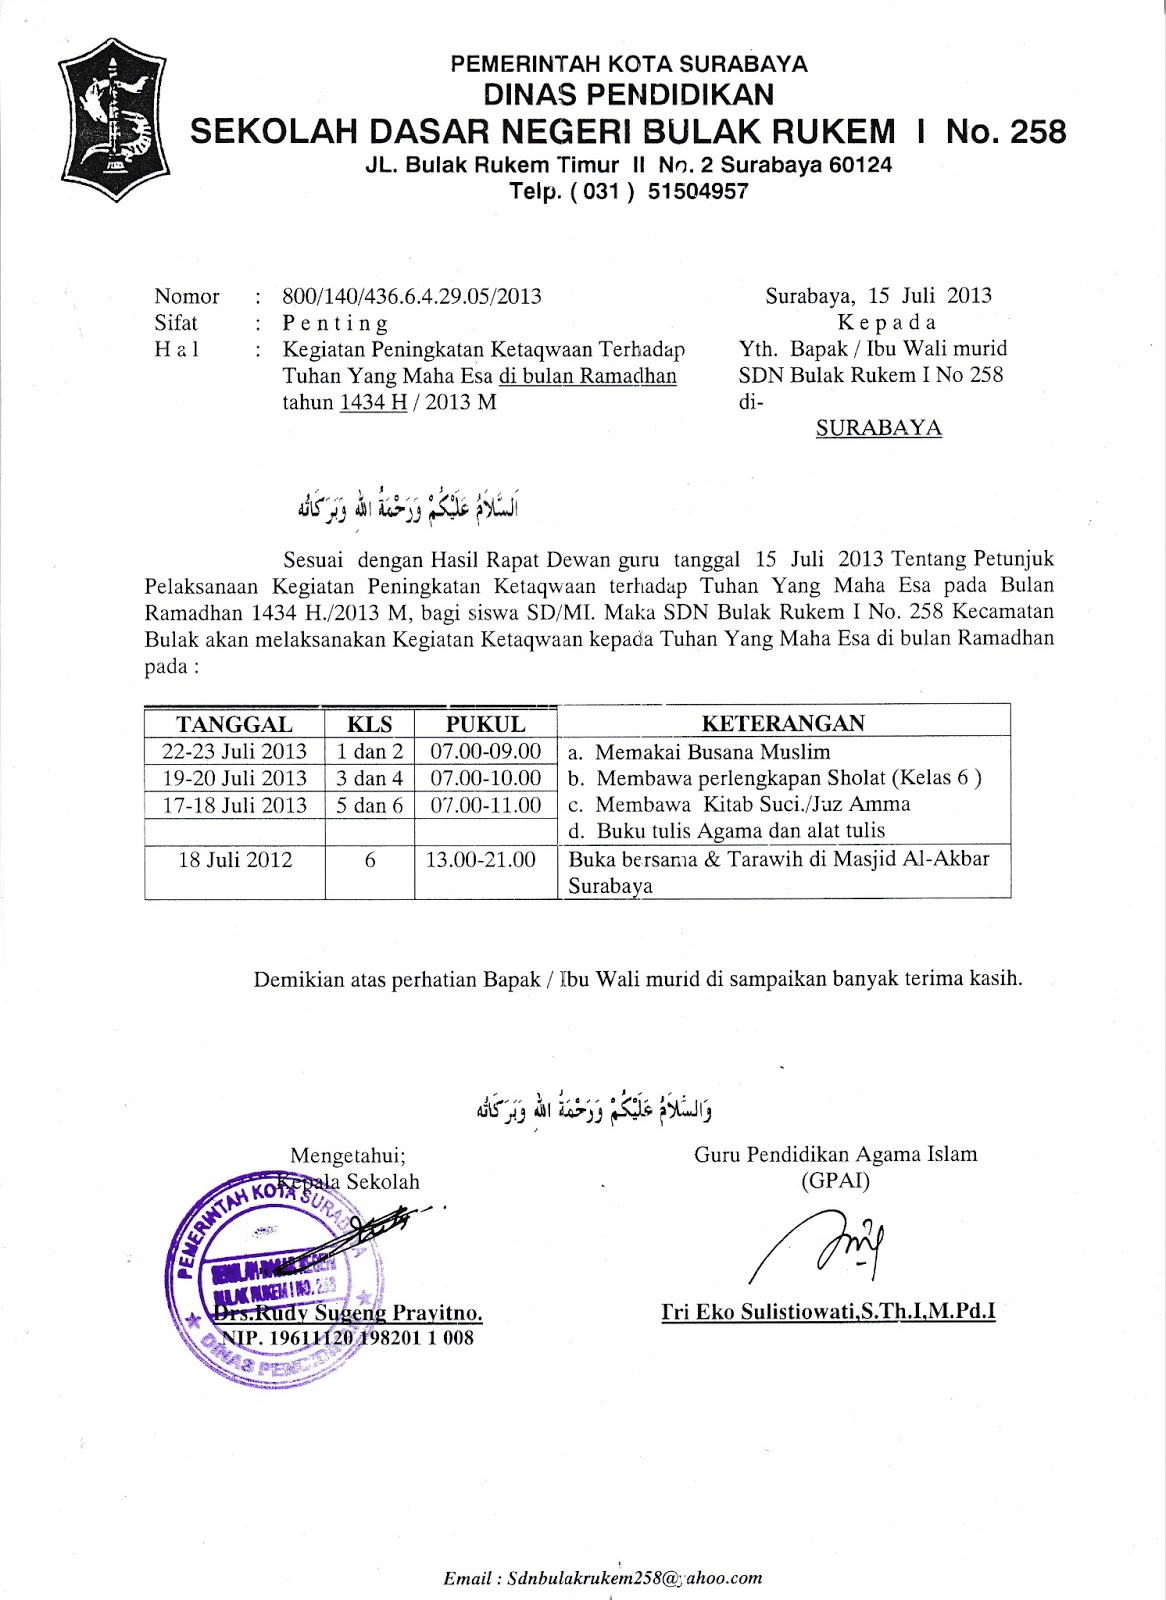 Sdn Bulak Rukem I No 258 Surabaya Surat Edaran